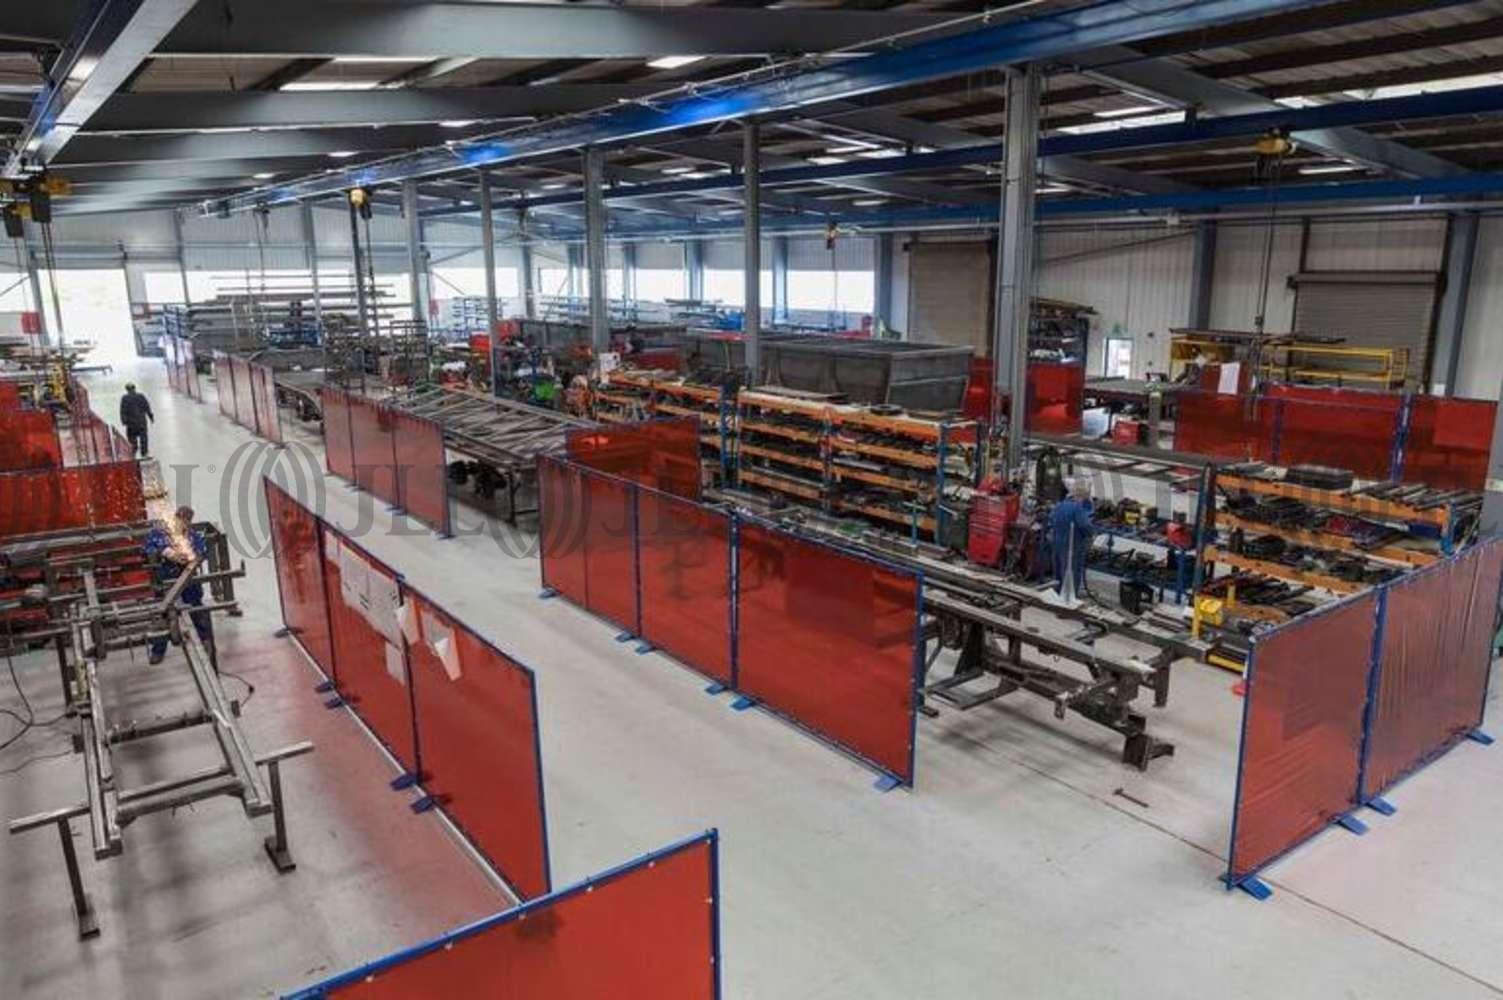 Industrial Southampton, SO32 2JQ - Ceejay Systems/Warwick Trailers - 5